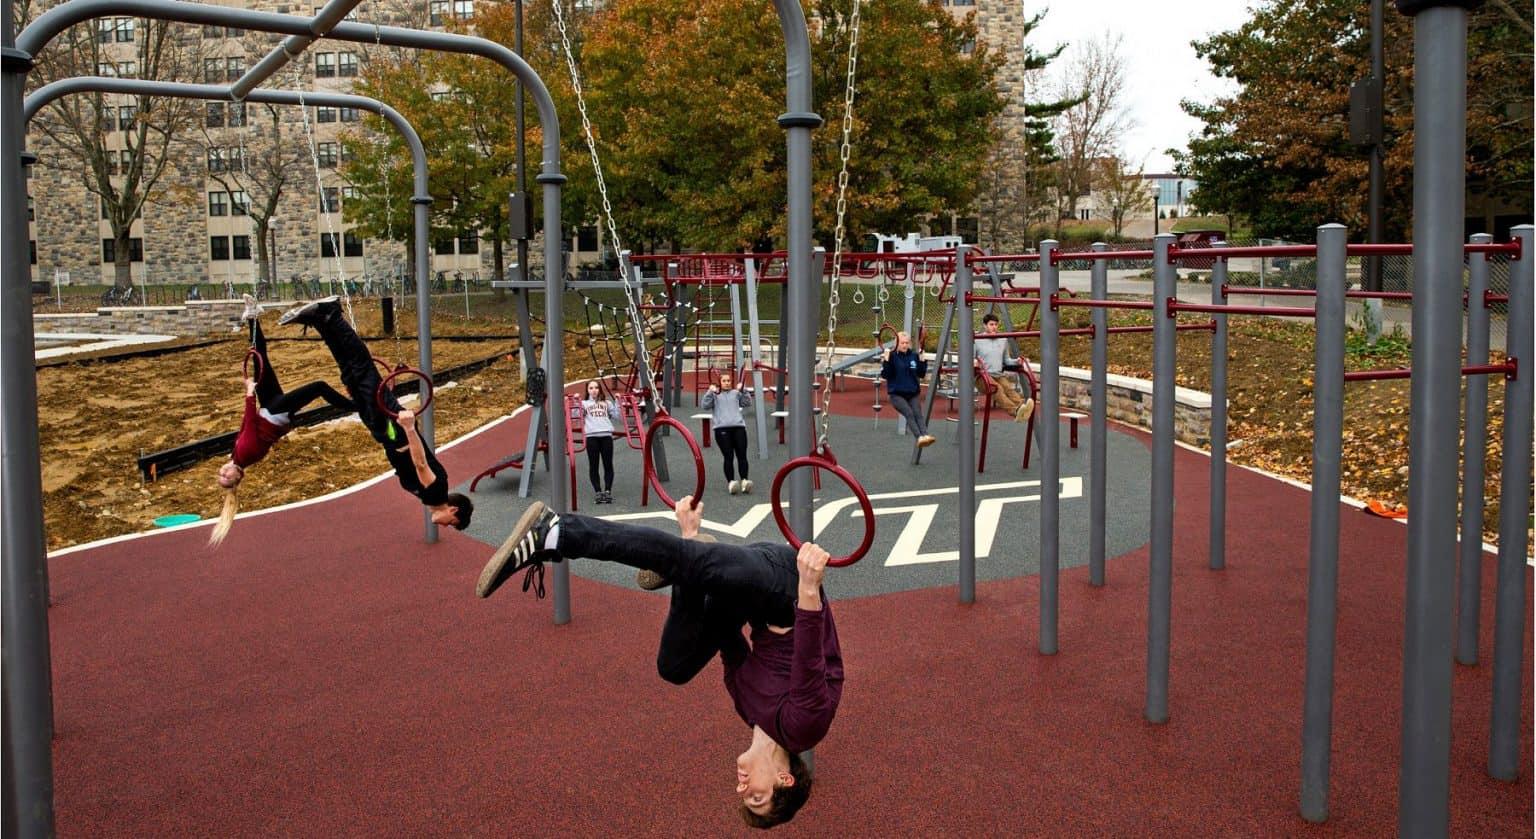 outdoor-fitness-equipment_49643787256_o-1536x839